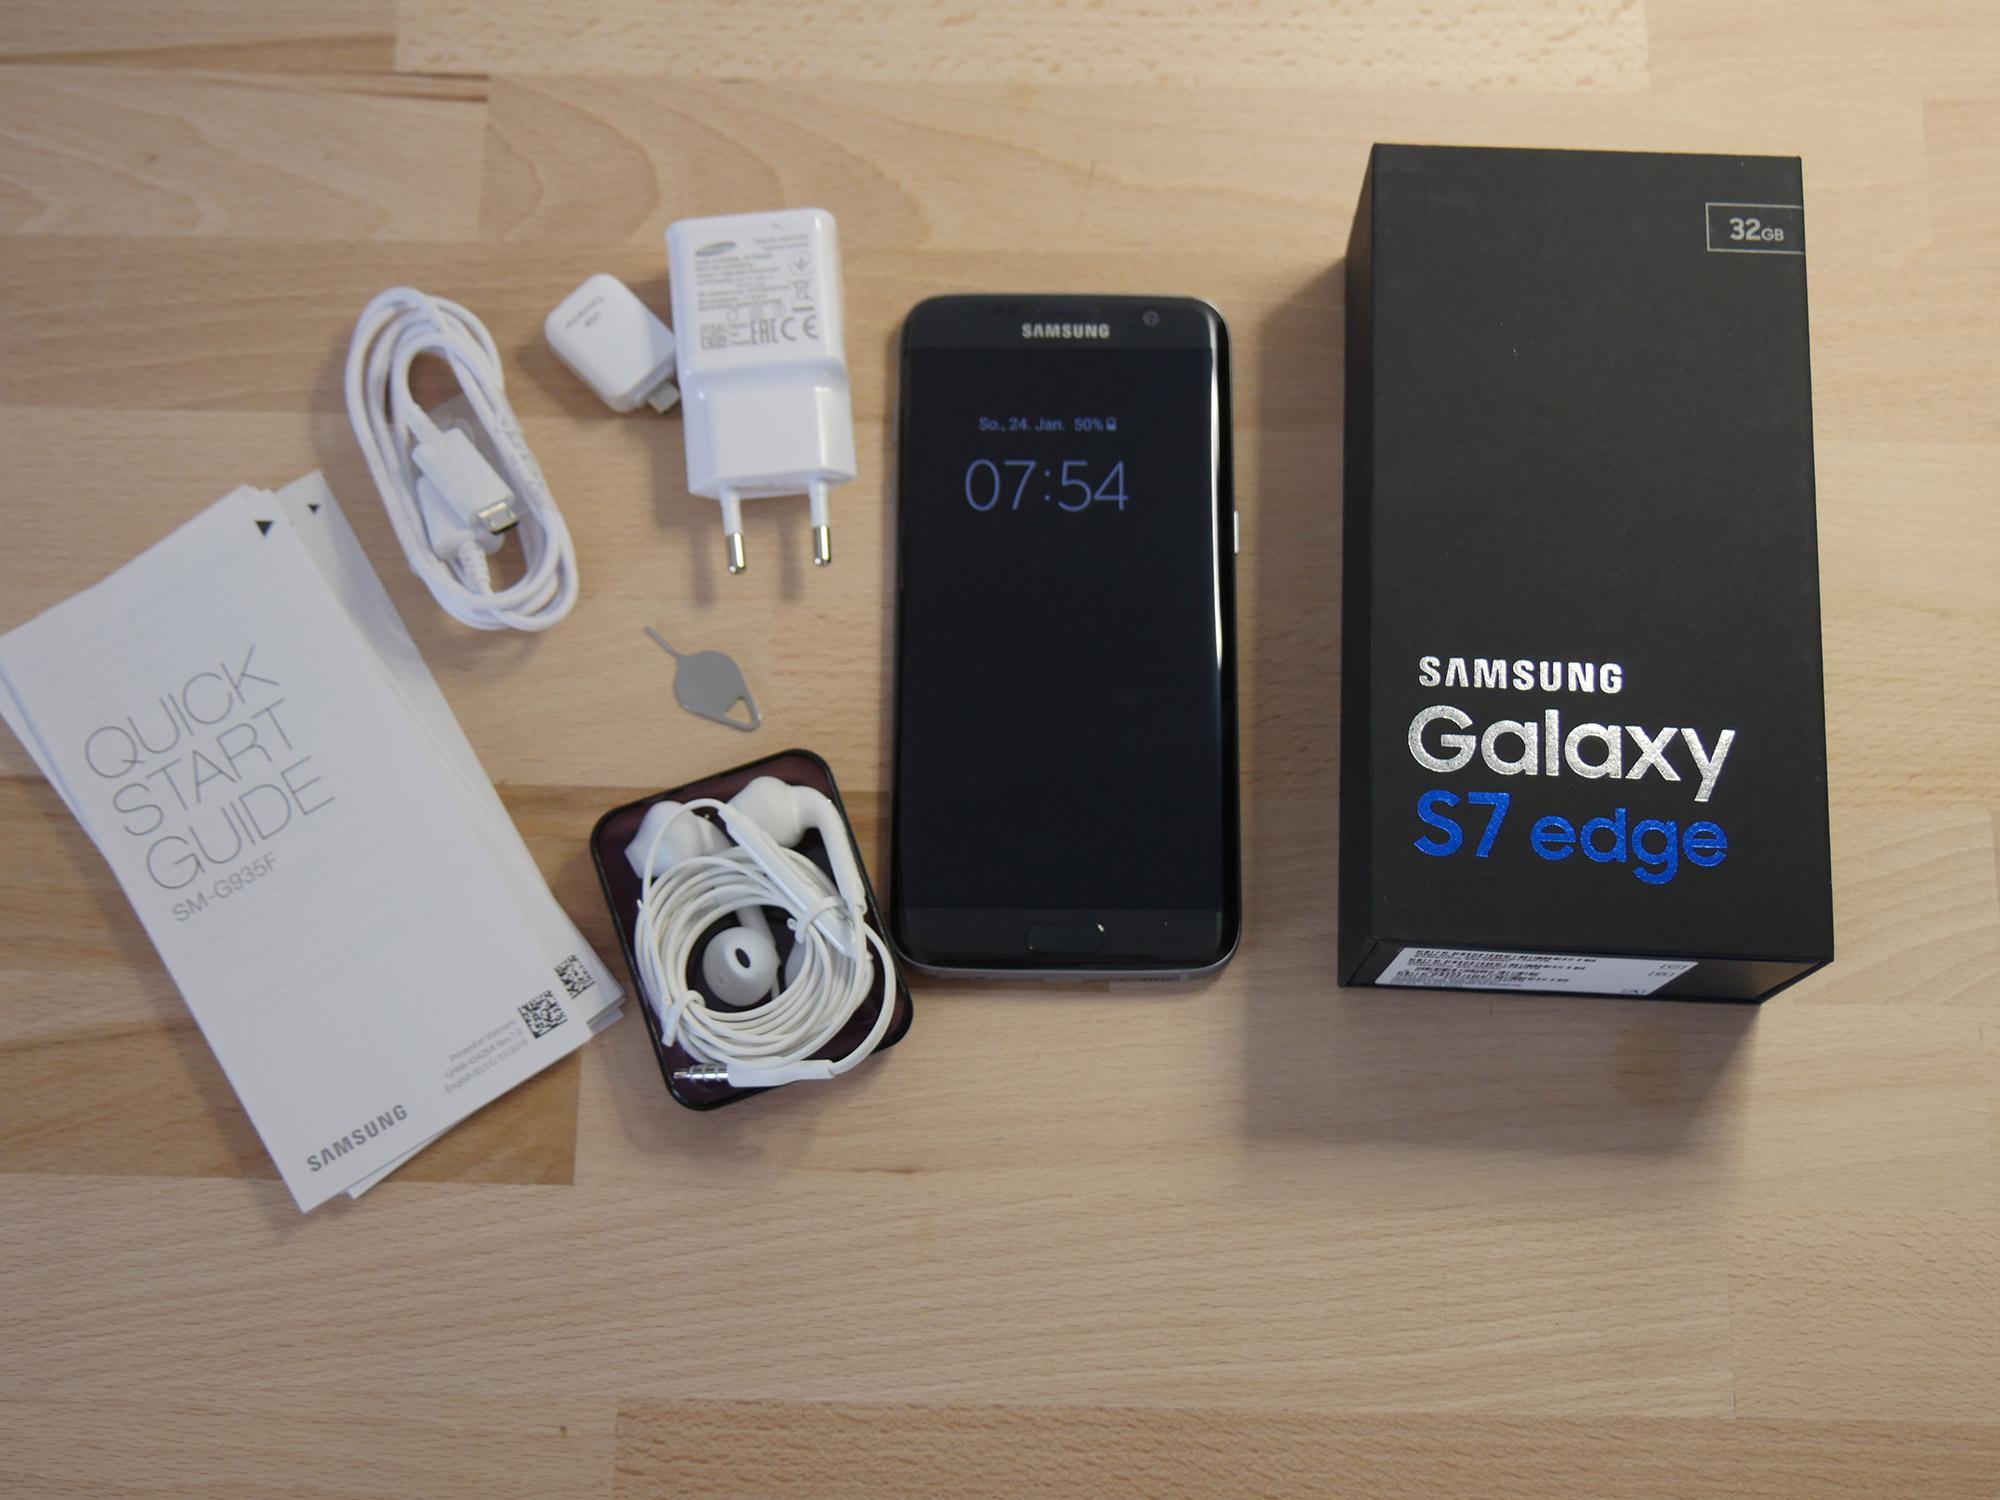 samsung galaxy s7 edge apple iphone 6s sony. Black Bedroom Furniture Sets. Home Design Ideas